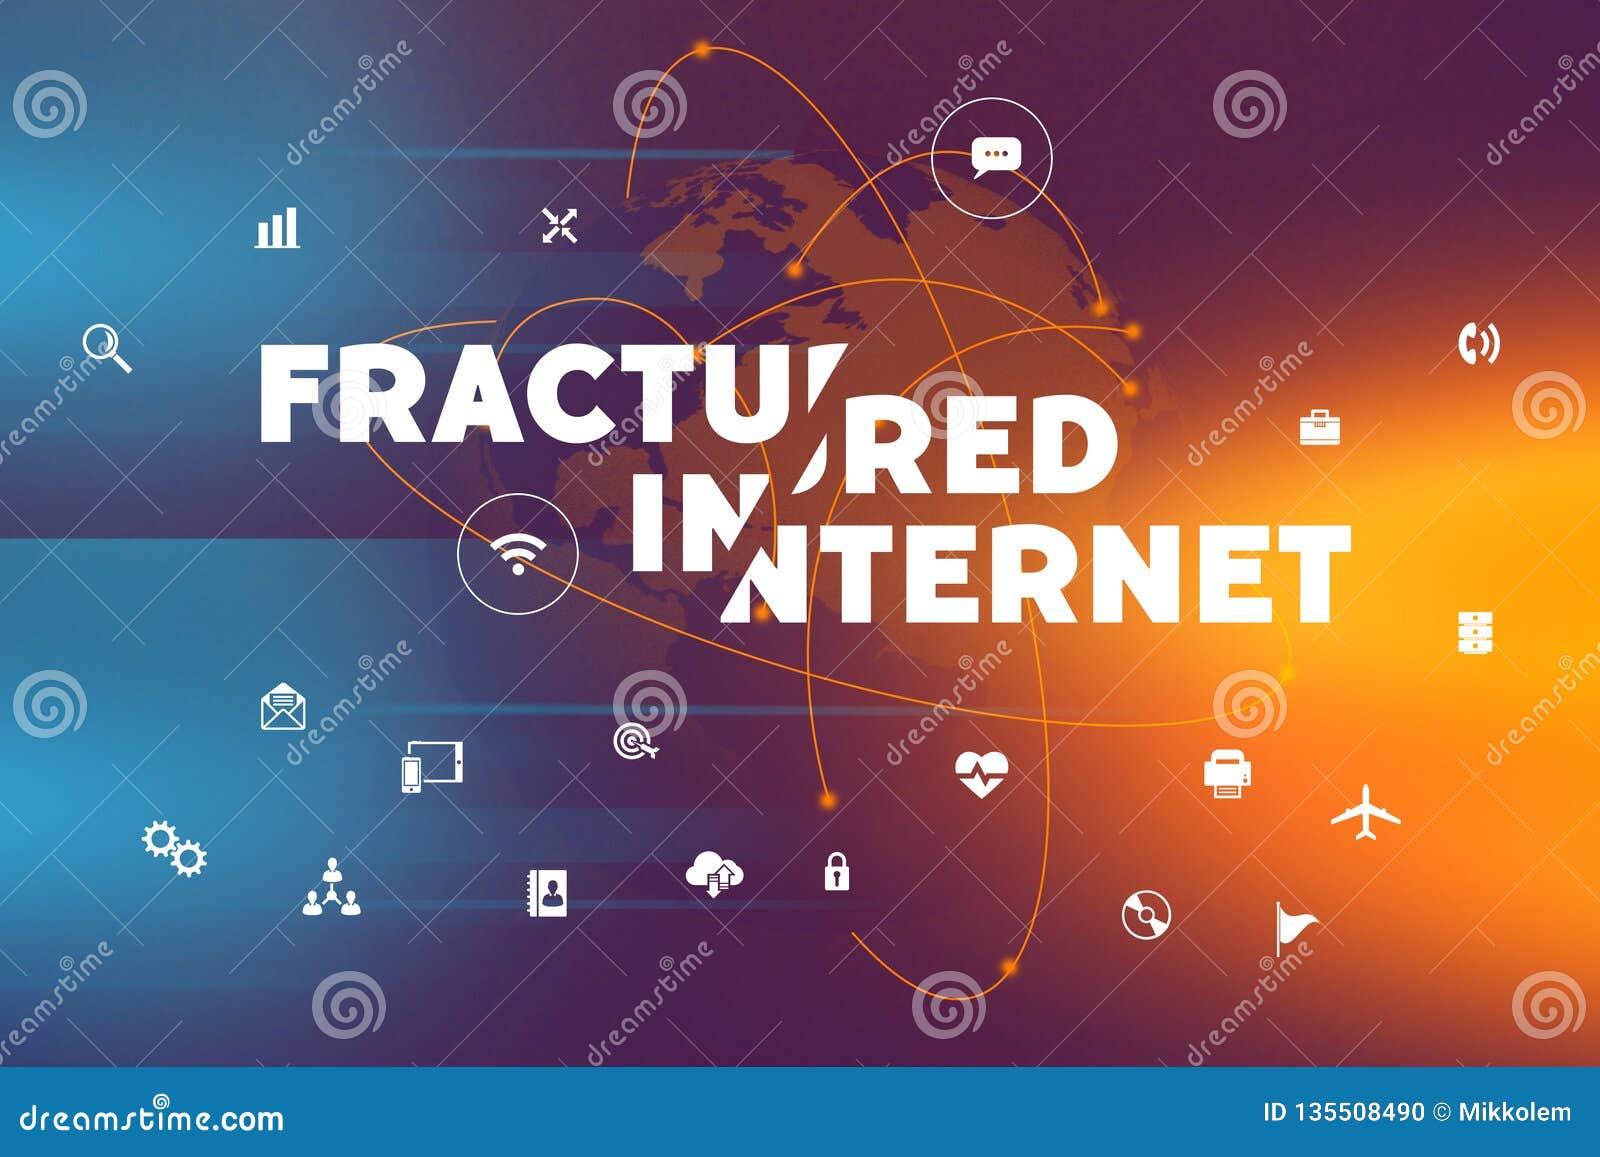 Fractured internet future concept